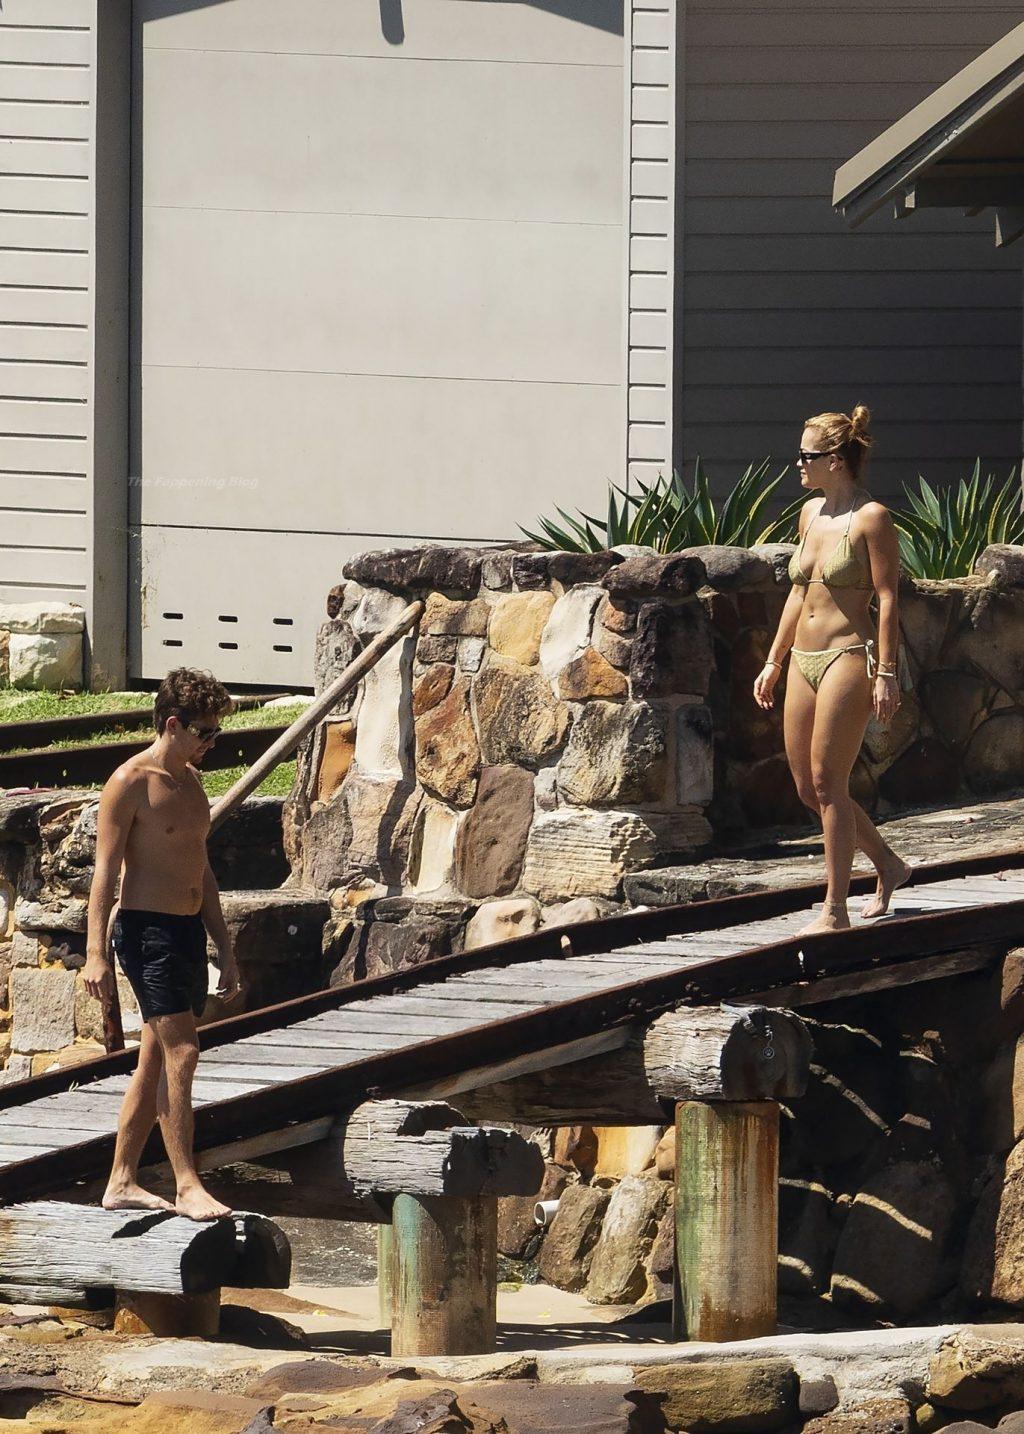 Rita Ora Soaks Up the Sun in a Bikini During a Family Trip at Sydney Harbor (29 Photos)